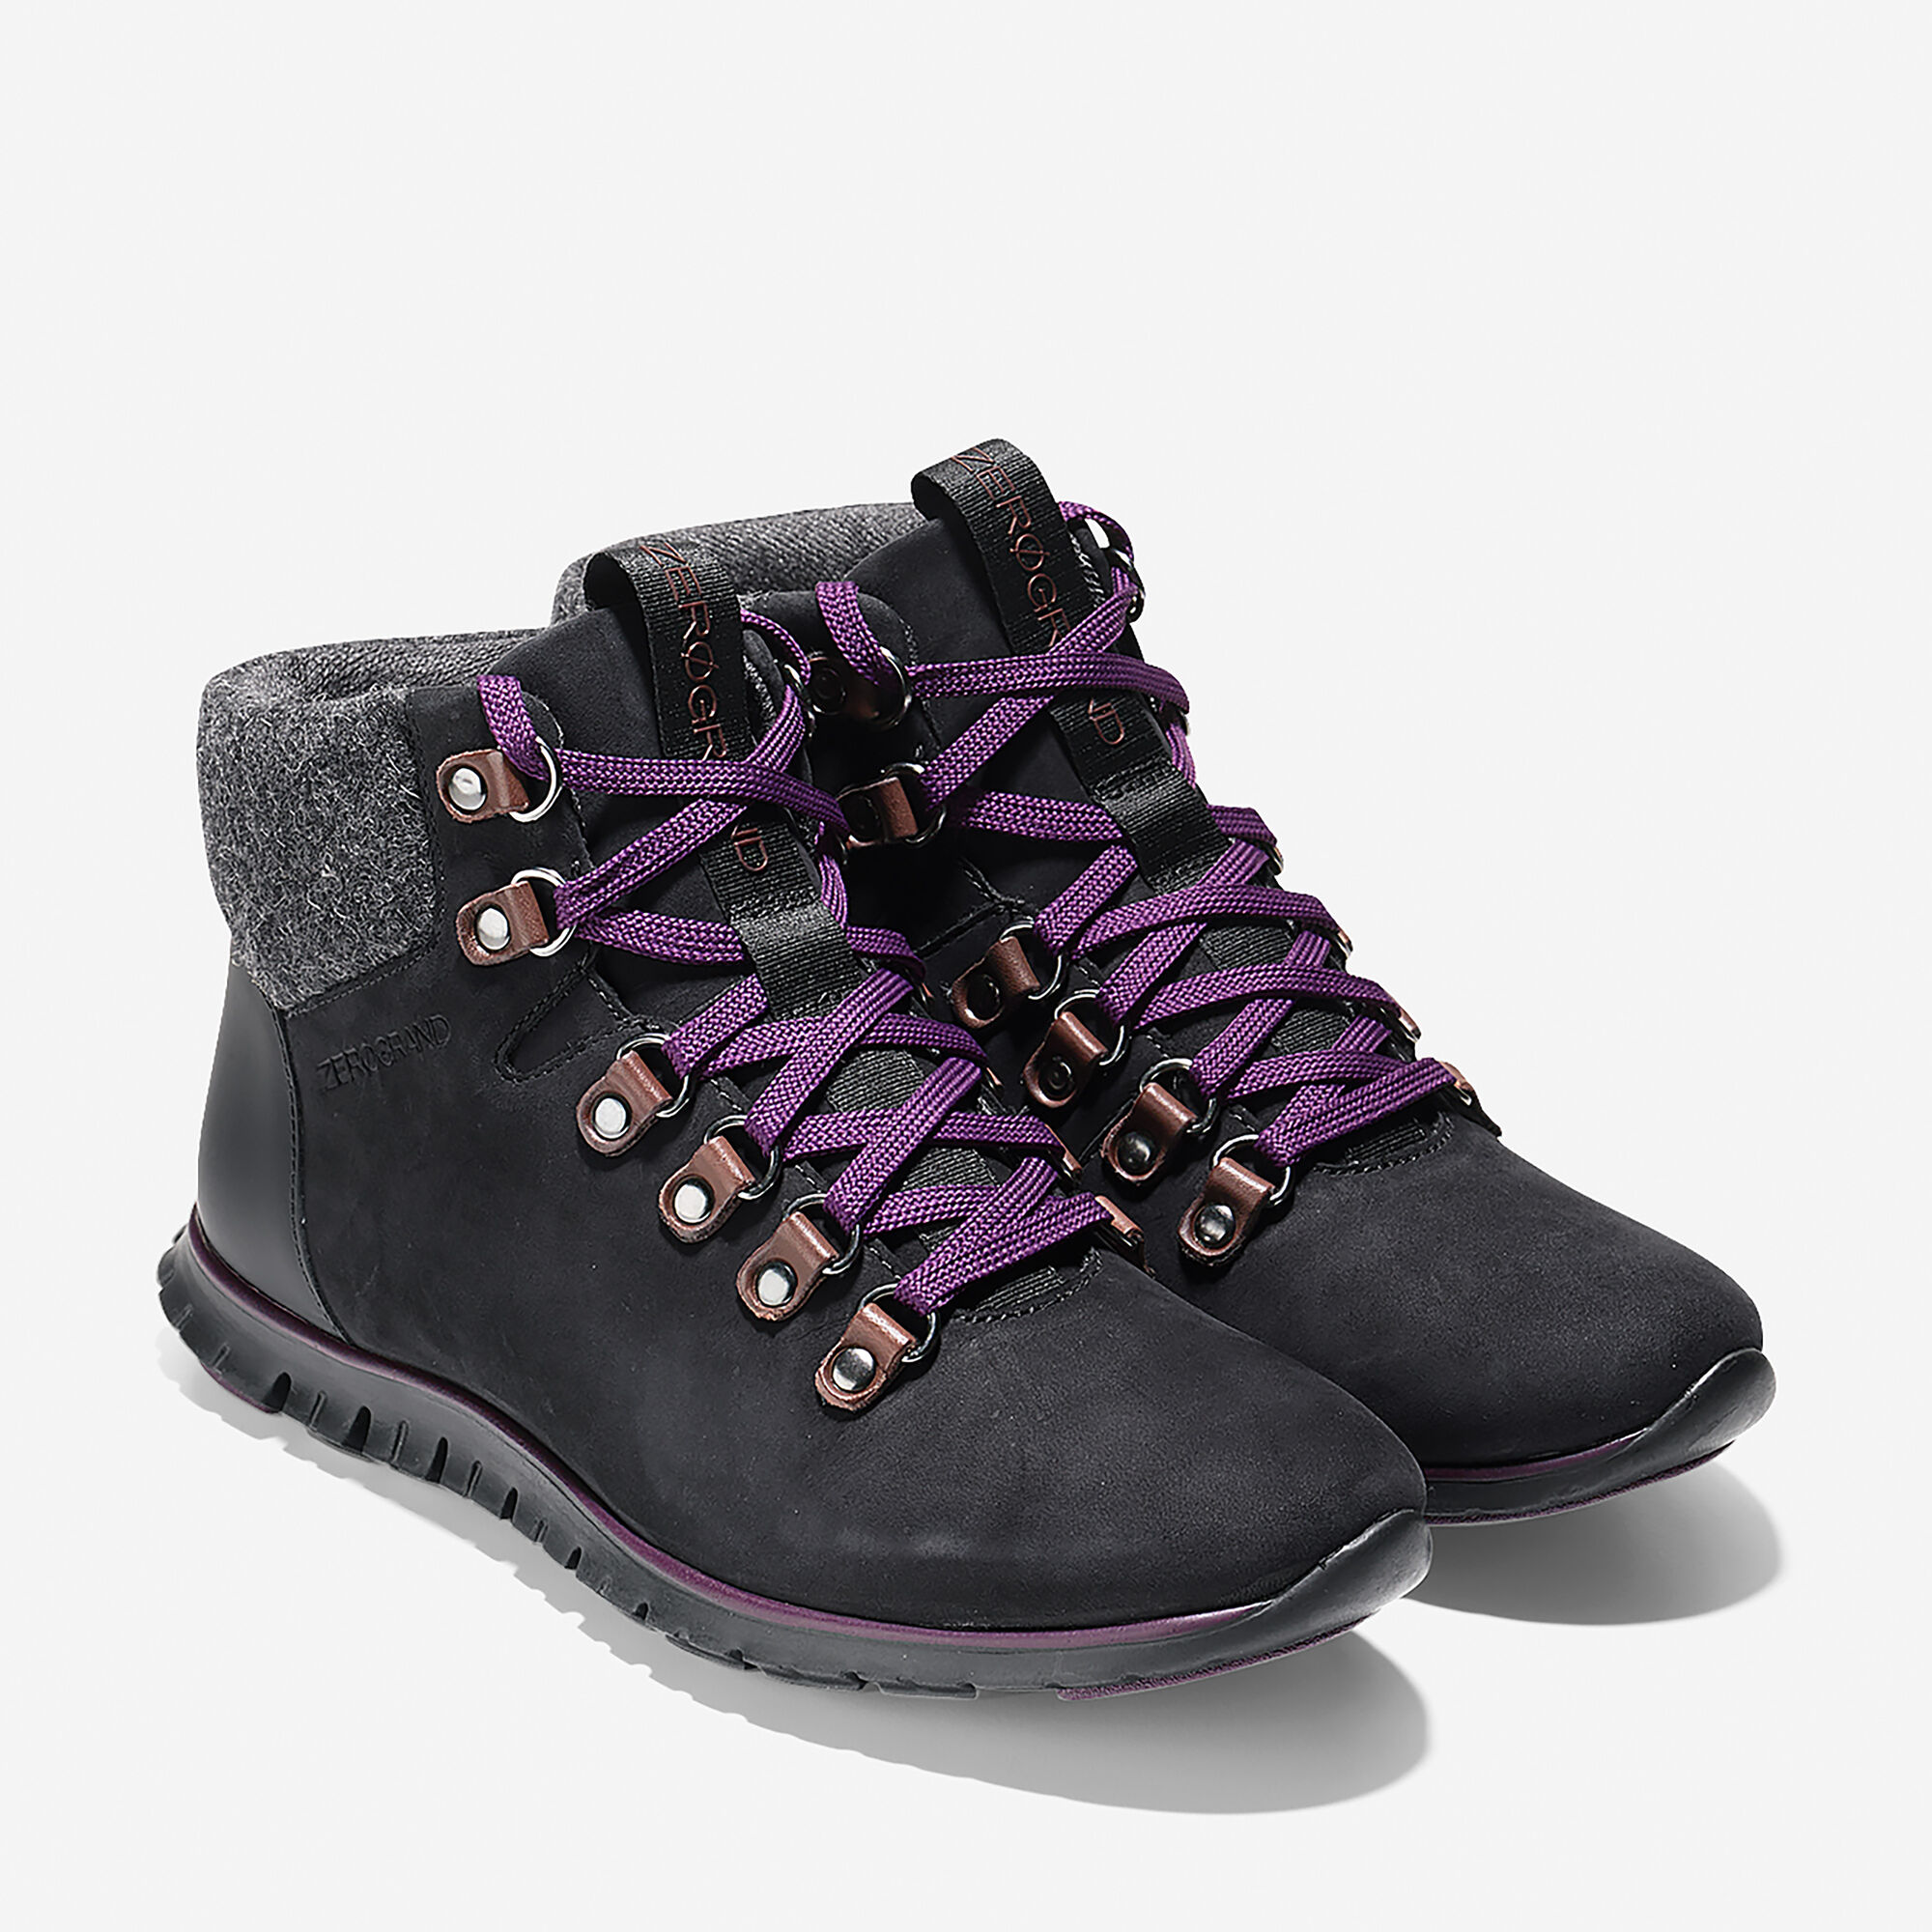 5eb537638ceb95 ZerøGrand Waterproof Hiker Boot in Black-Elderberry Waterproof ...